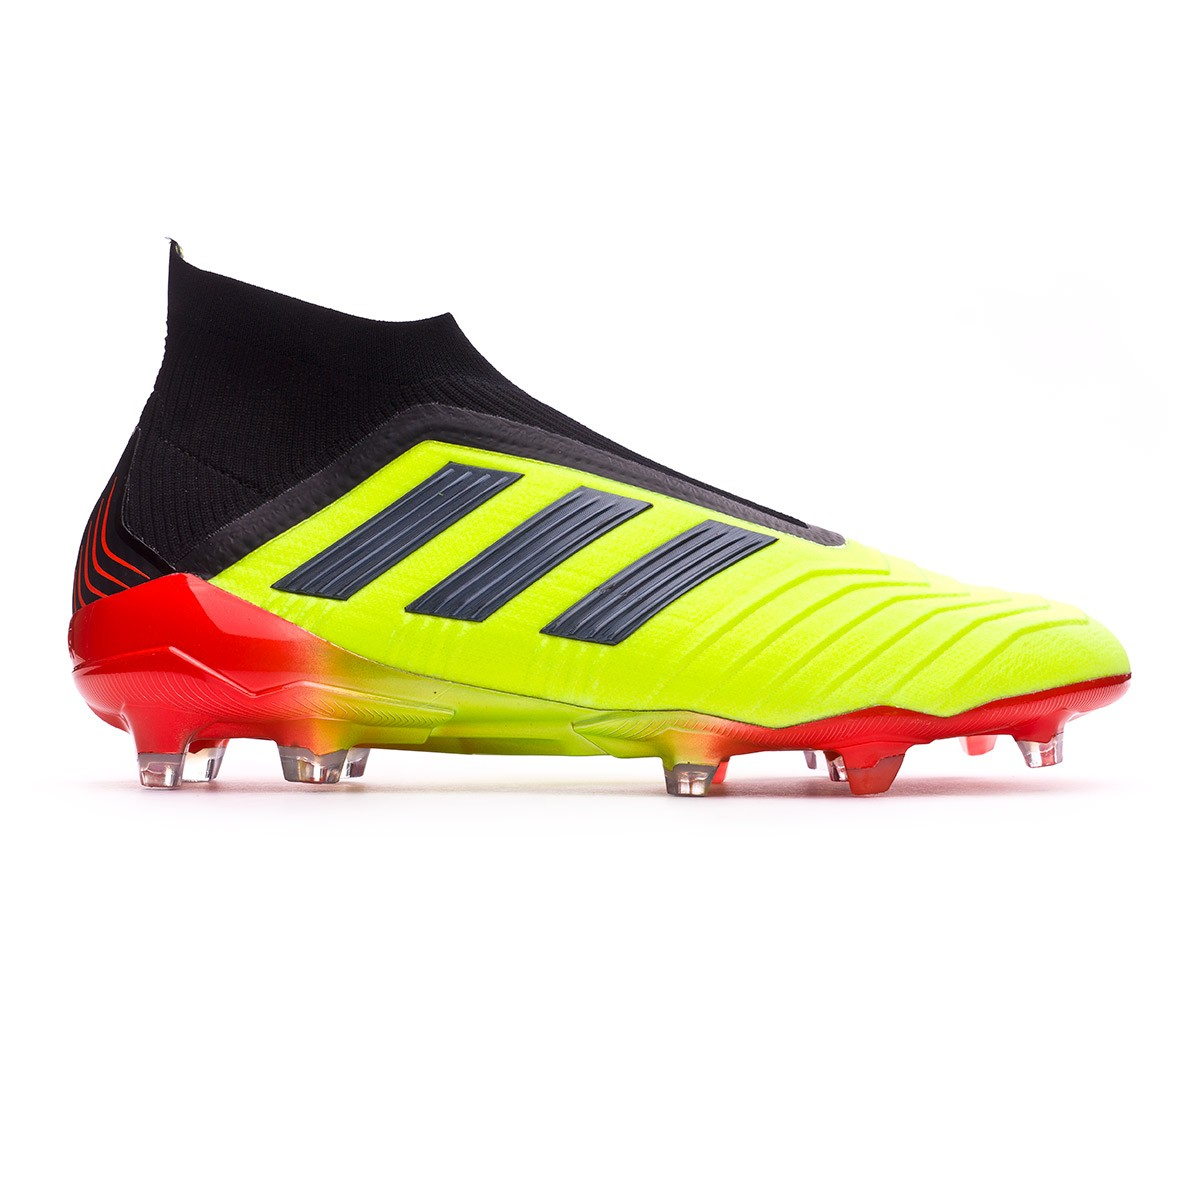 c05e6b3ed9d3 Football Boots adidas Predator 18+ FG Solar yellow-Black-Solar red - Tienda  de fútbol Fútbol Emotion